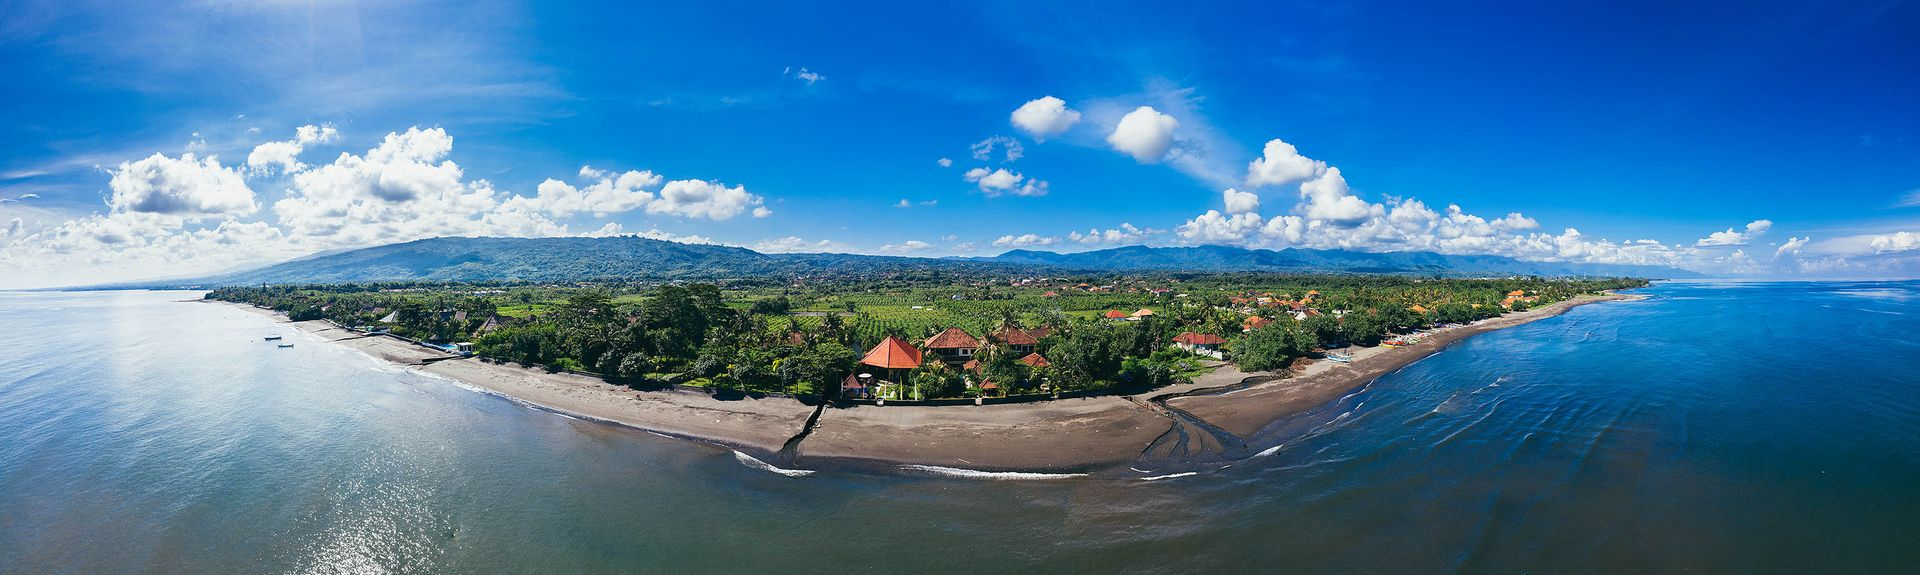 Reggenza di Buleleng, Bali, Indonesia